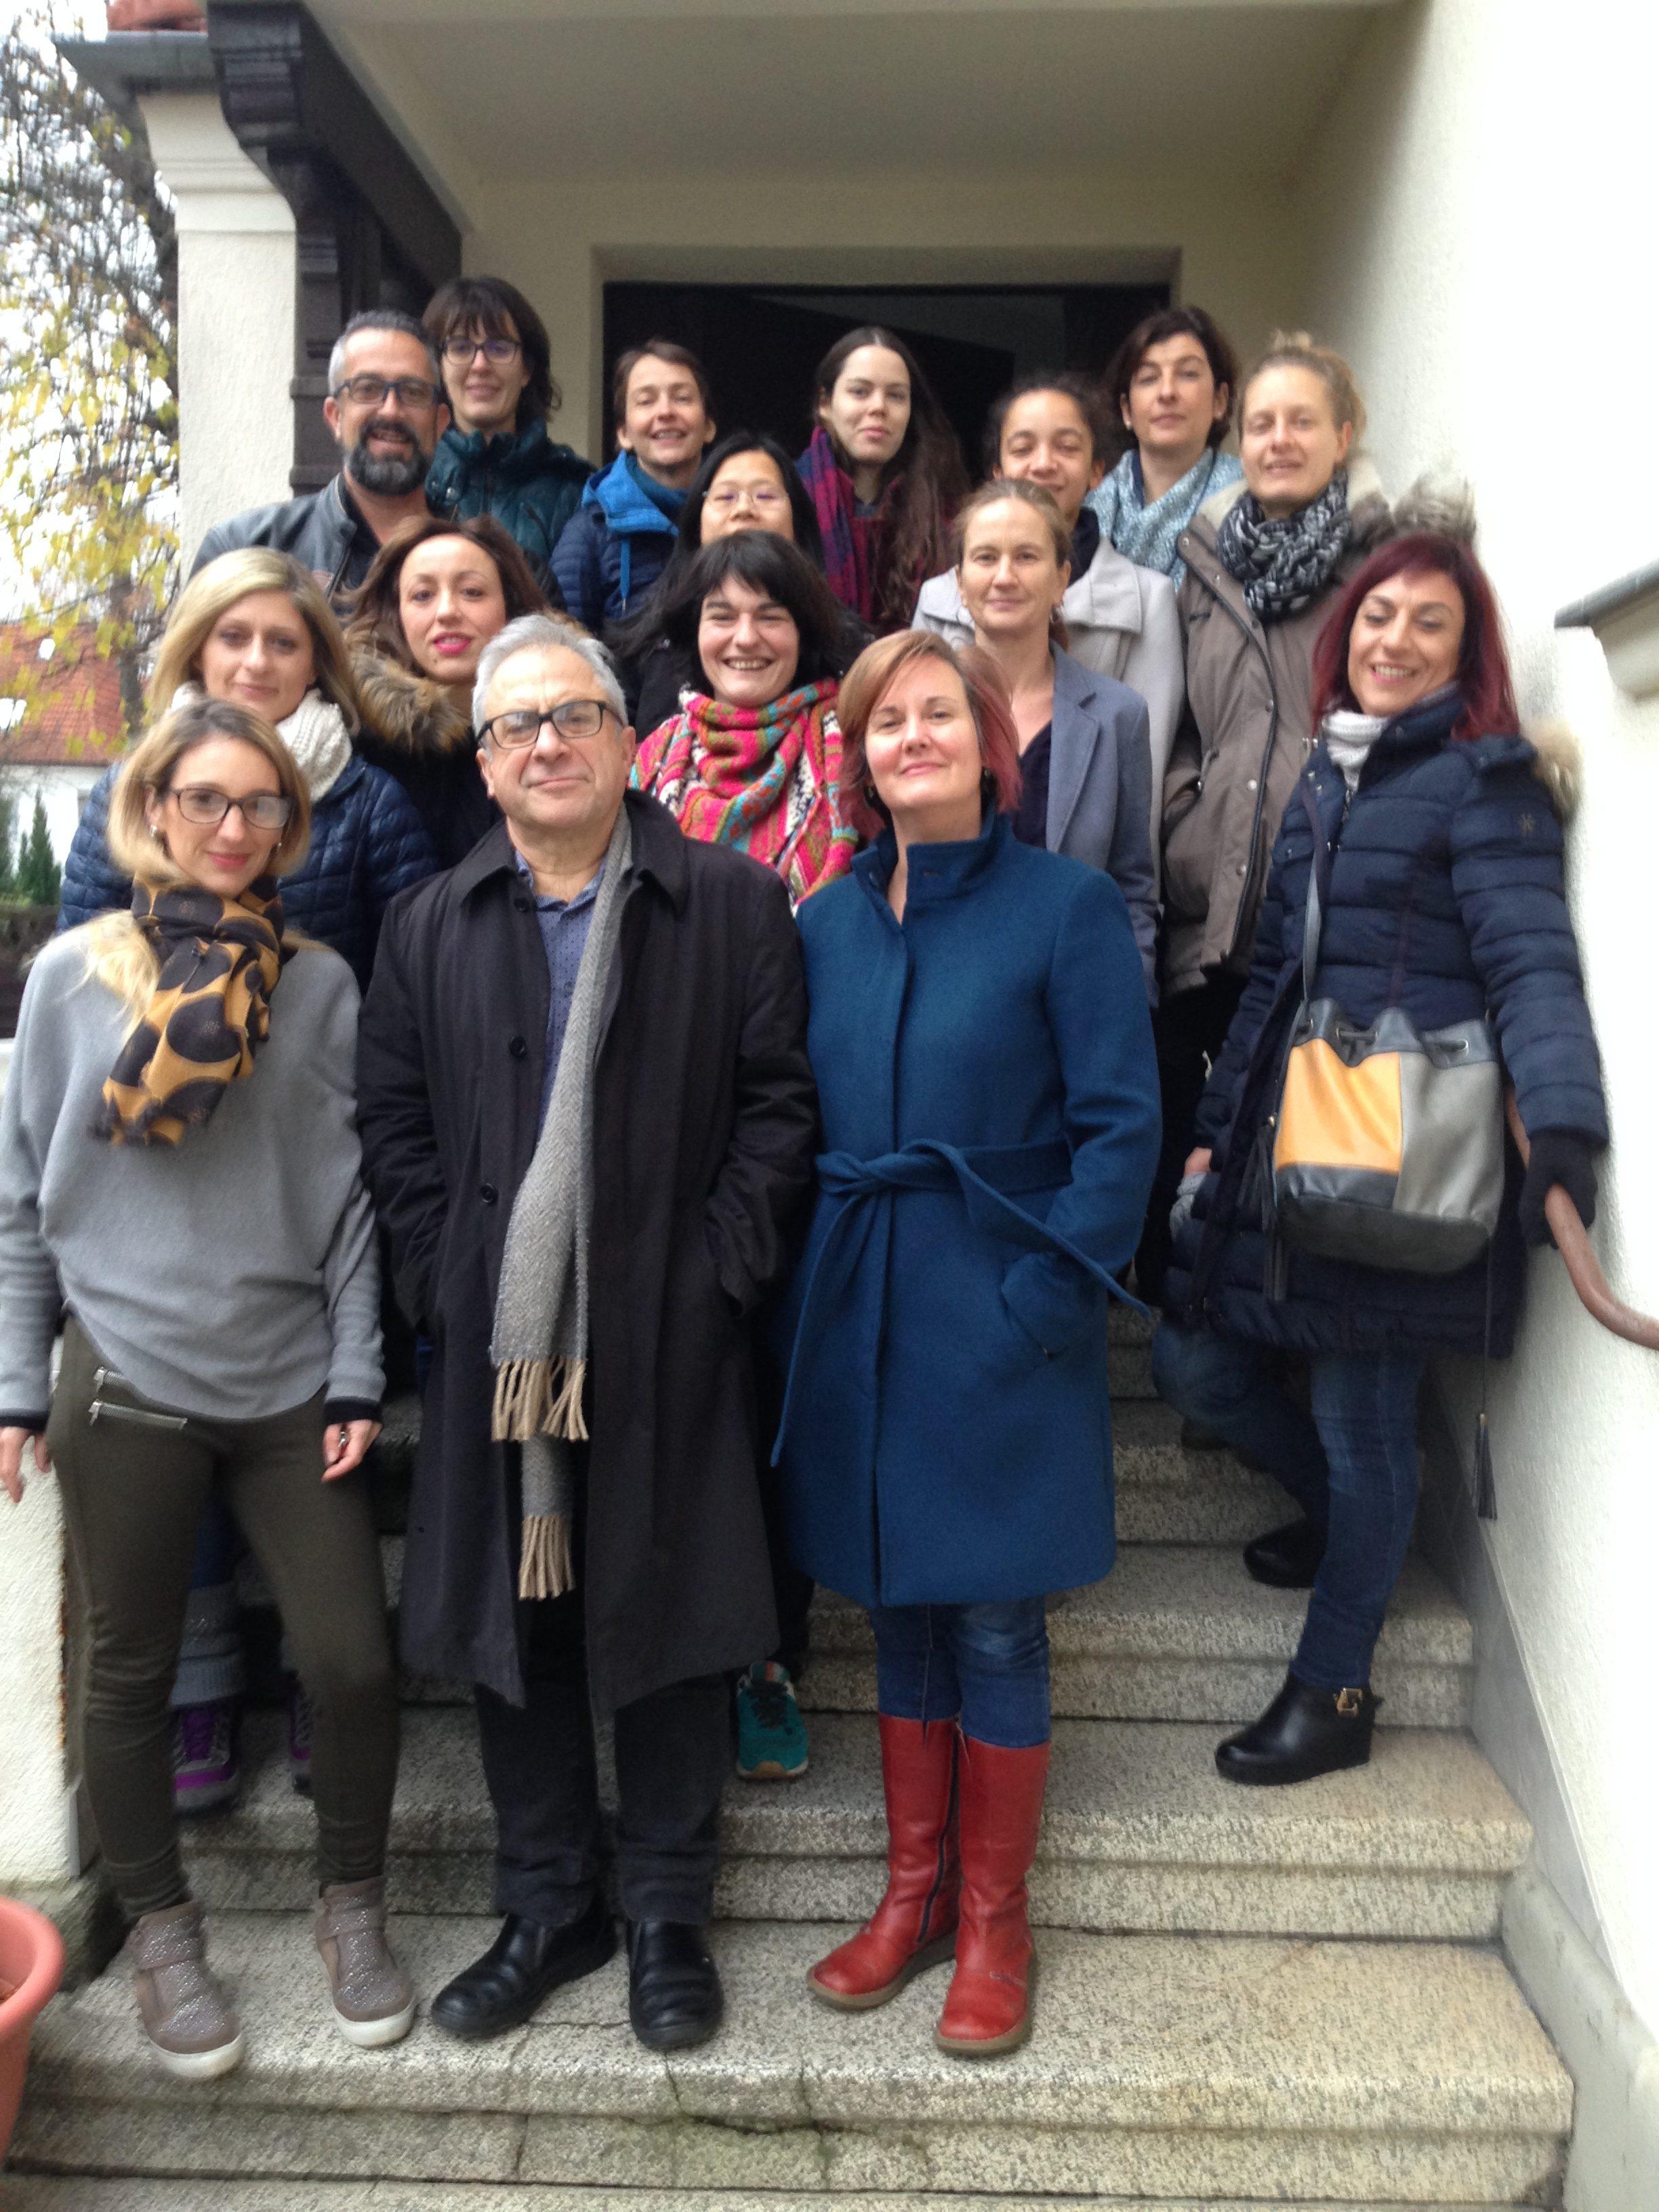 Erasmus + échanges de pratique projet européen allemagne france irlande grèce adav 33 odyssée inclusion intégration germany irlande greece